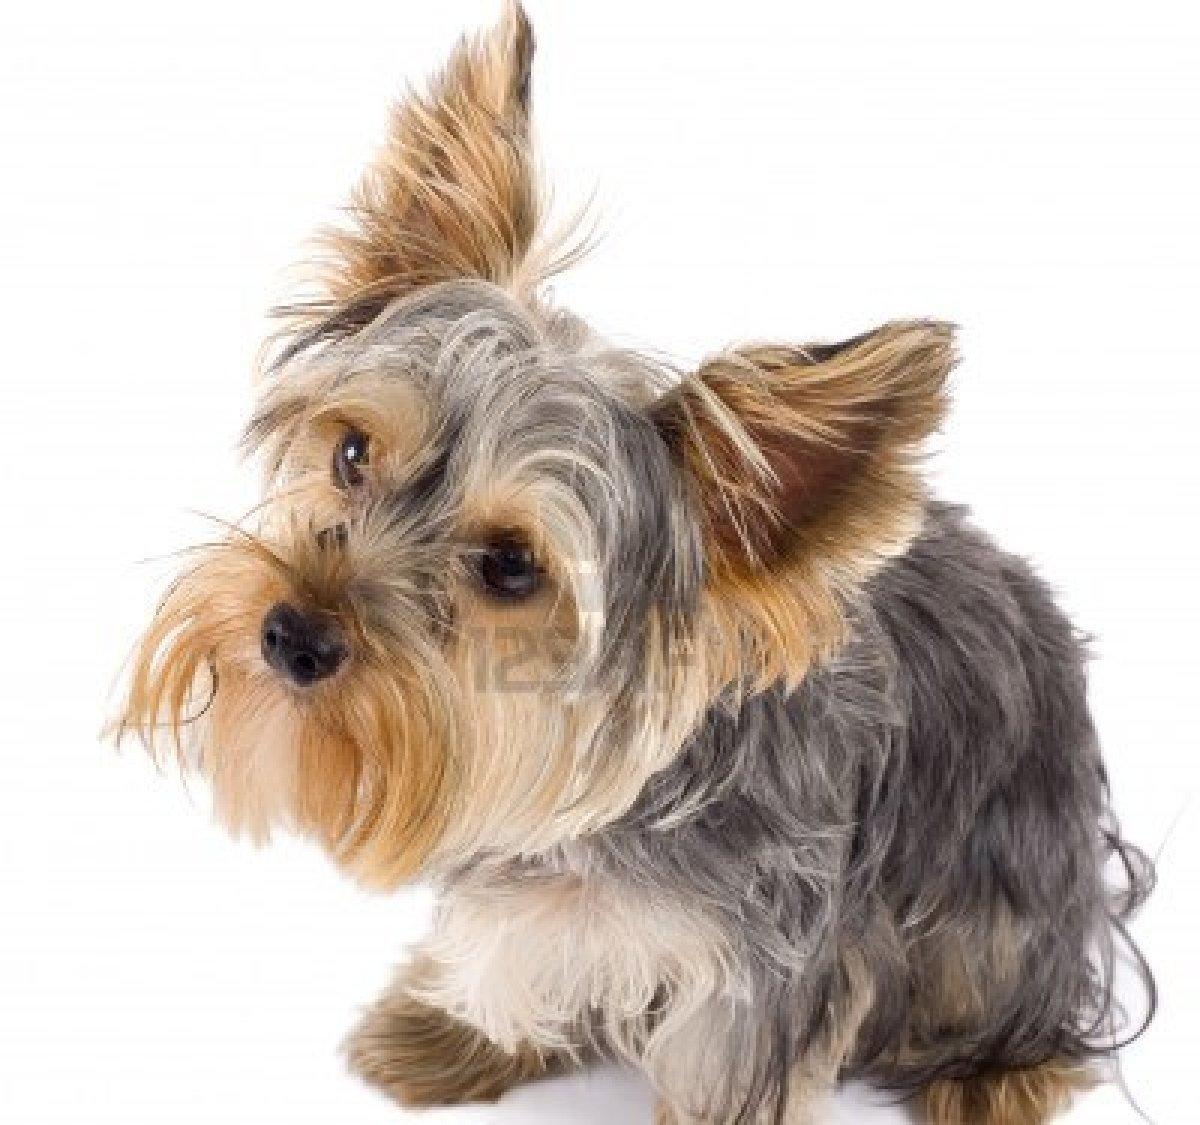 Newhairstylesformen2014 Com: Black And White Yorkie Dogs Black And White Yorkie Dogs